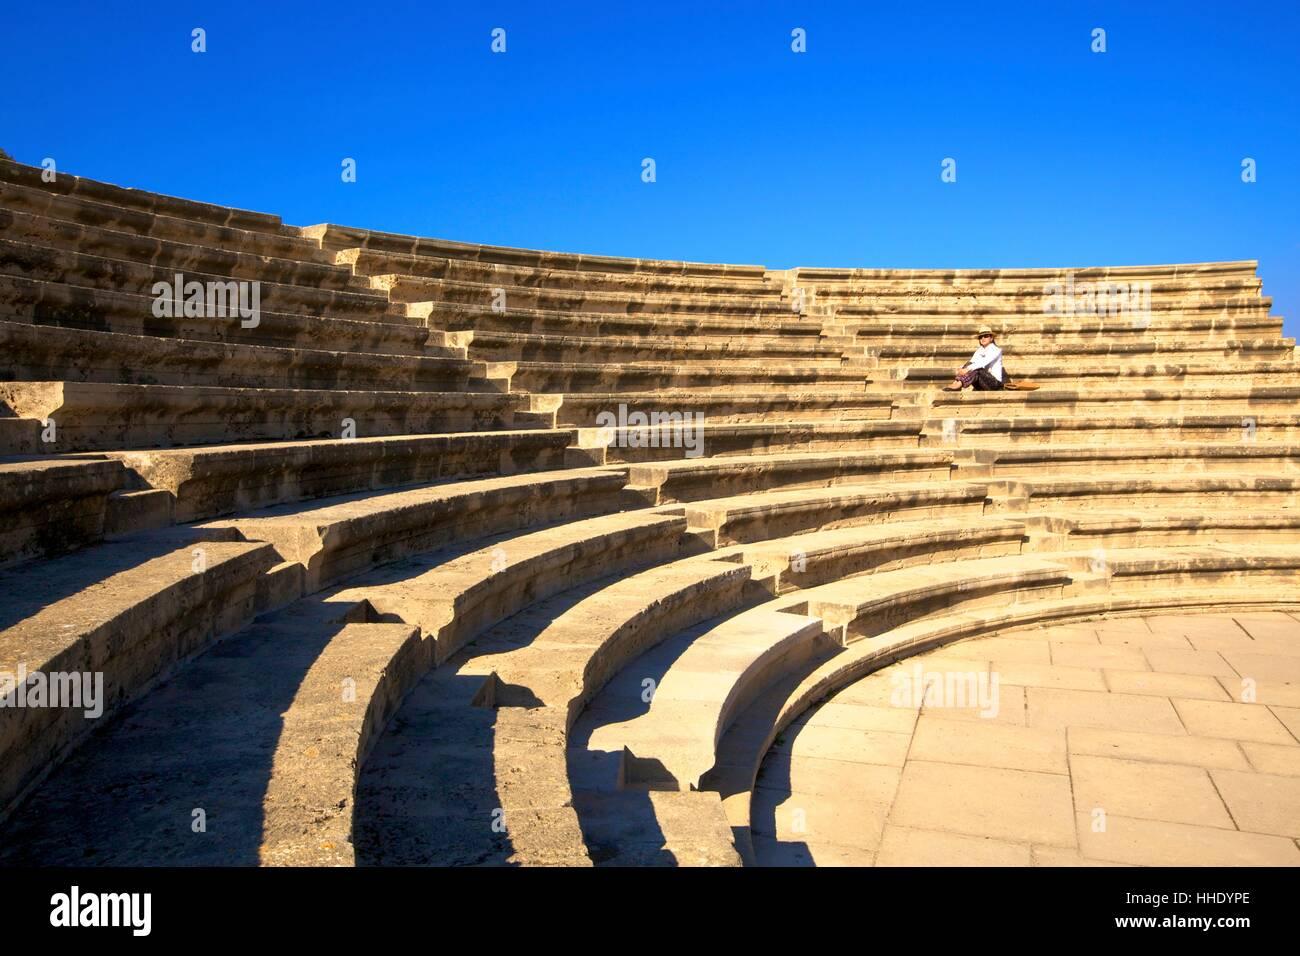 Roman Odeon, Kato Paphos Archaeological Park, UNESCO, Paphos, Cyprus, Eastern Mediterranean - Stock Image